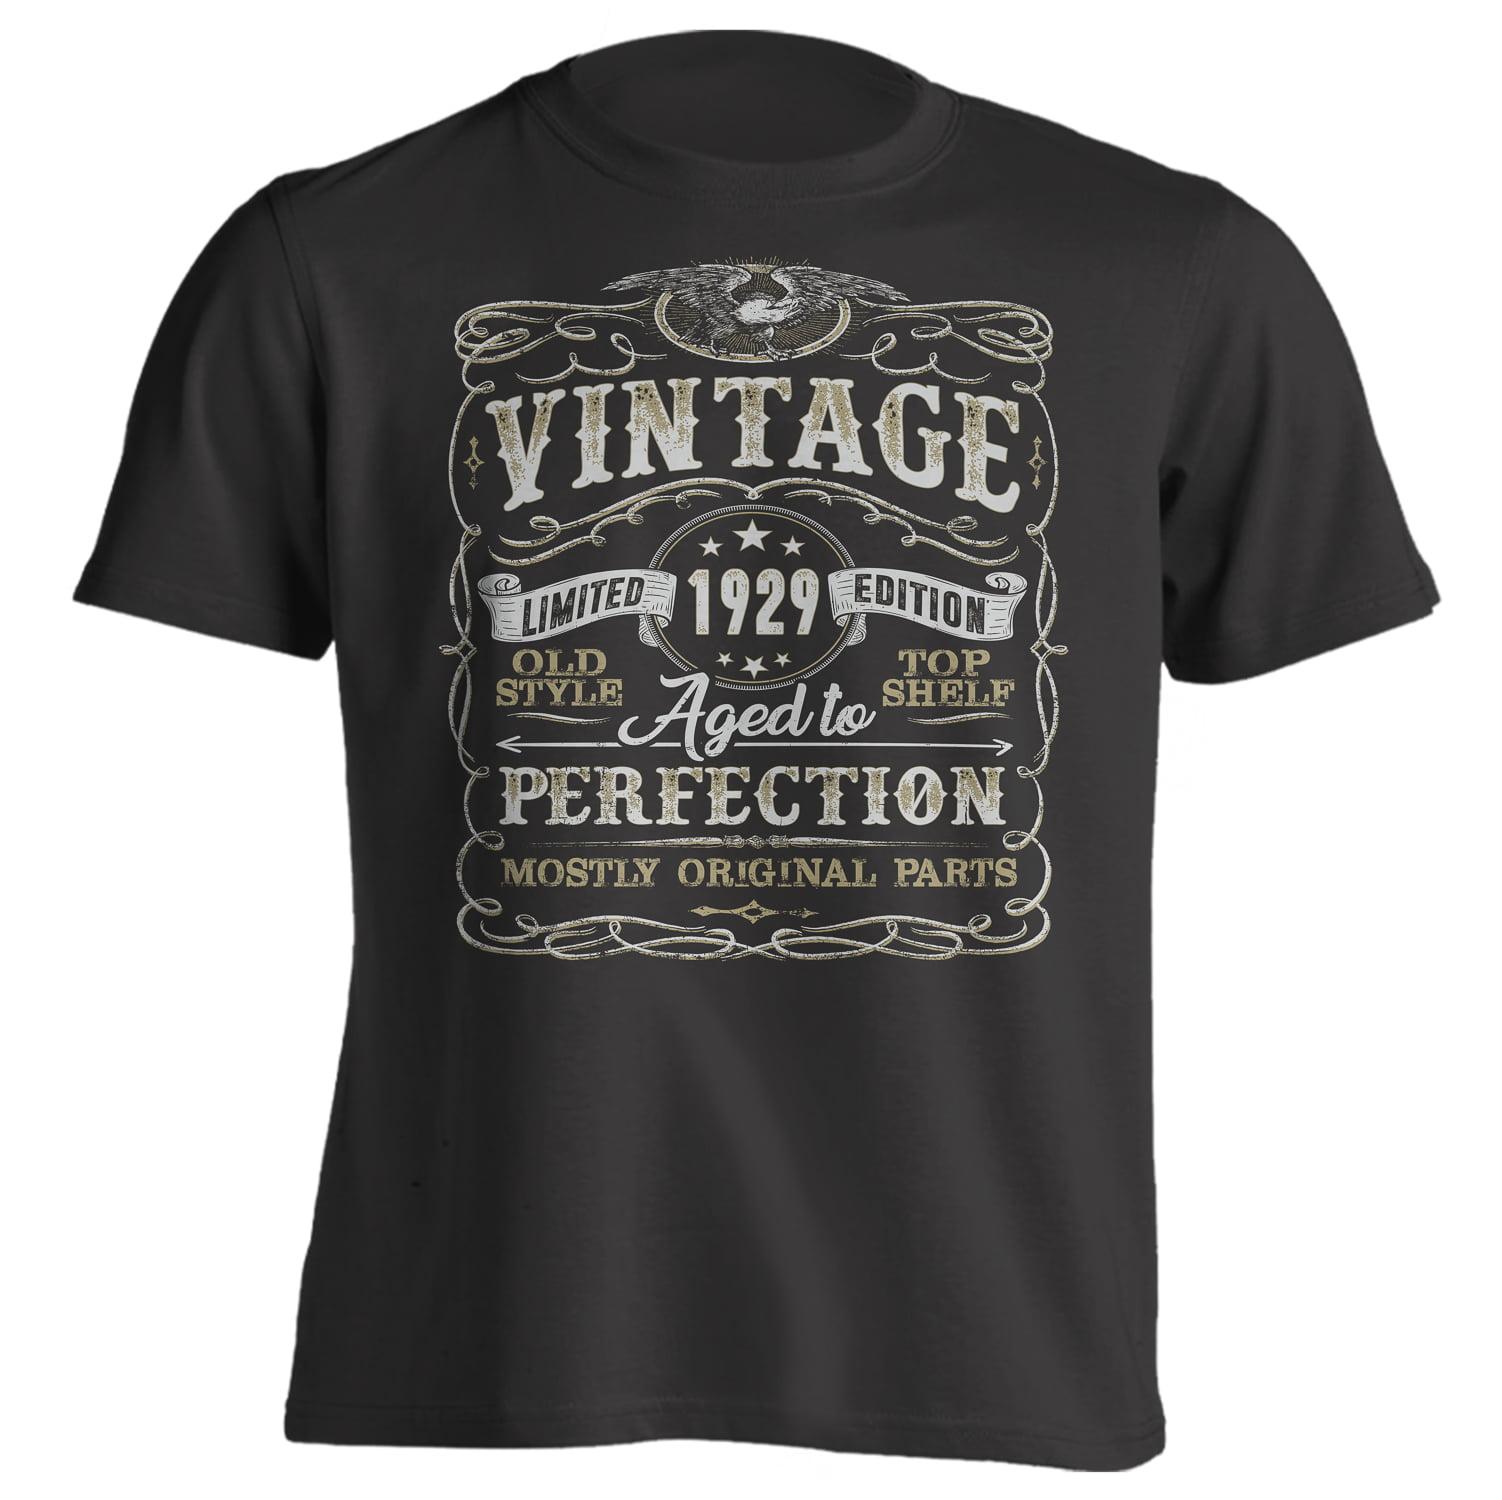 Oldt Shirt Bobbydaleearnhardt.com